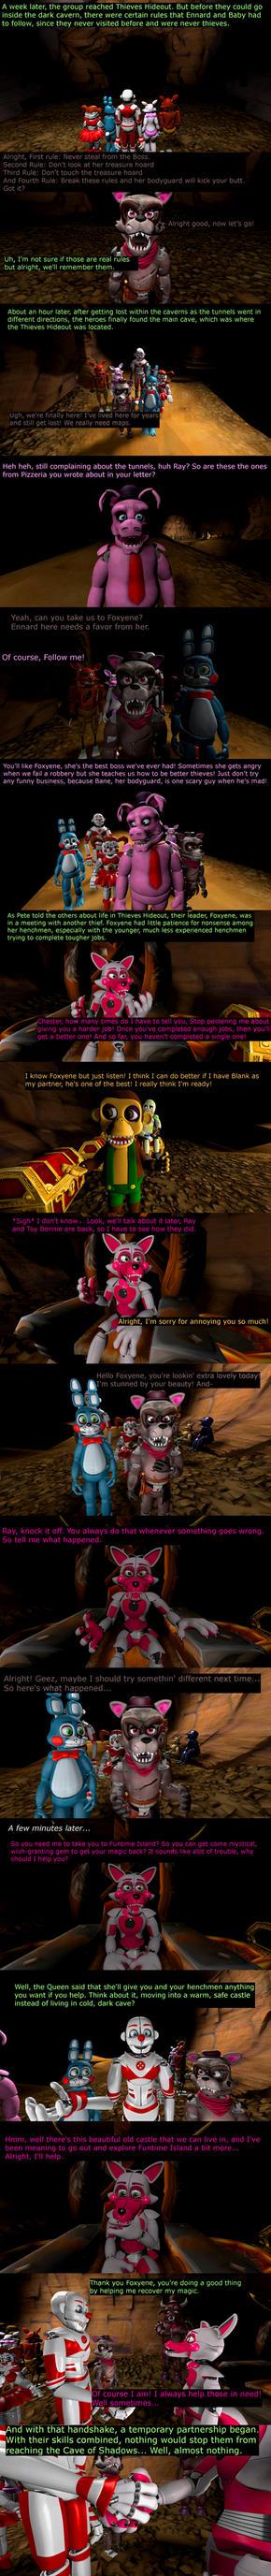 Bedtime Story 2 Part 7 by EmeraldWerewolfHeart